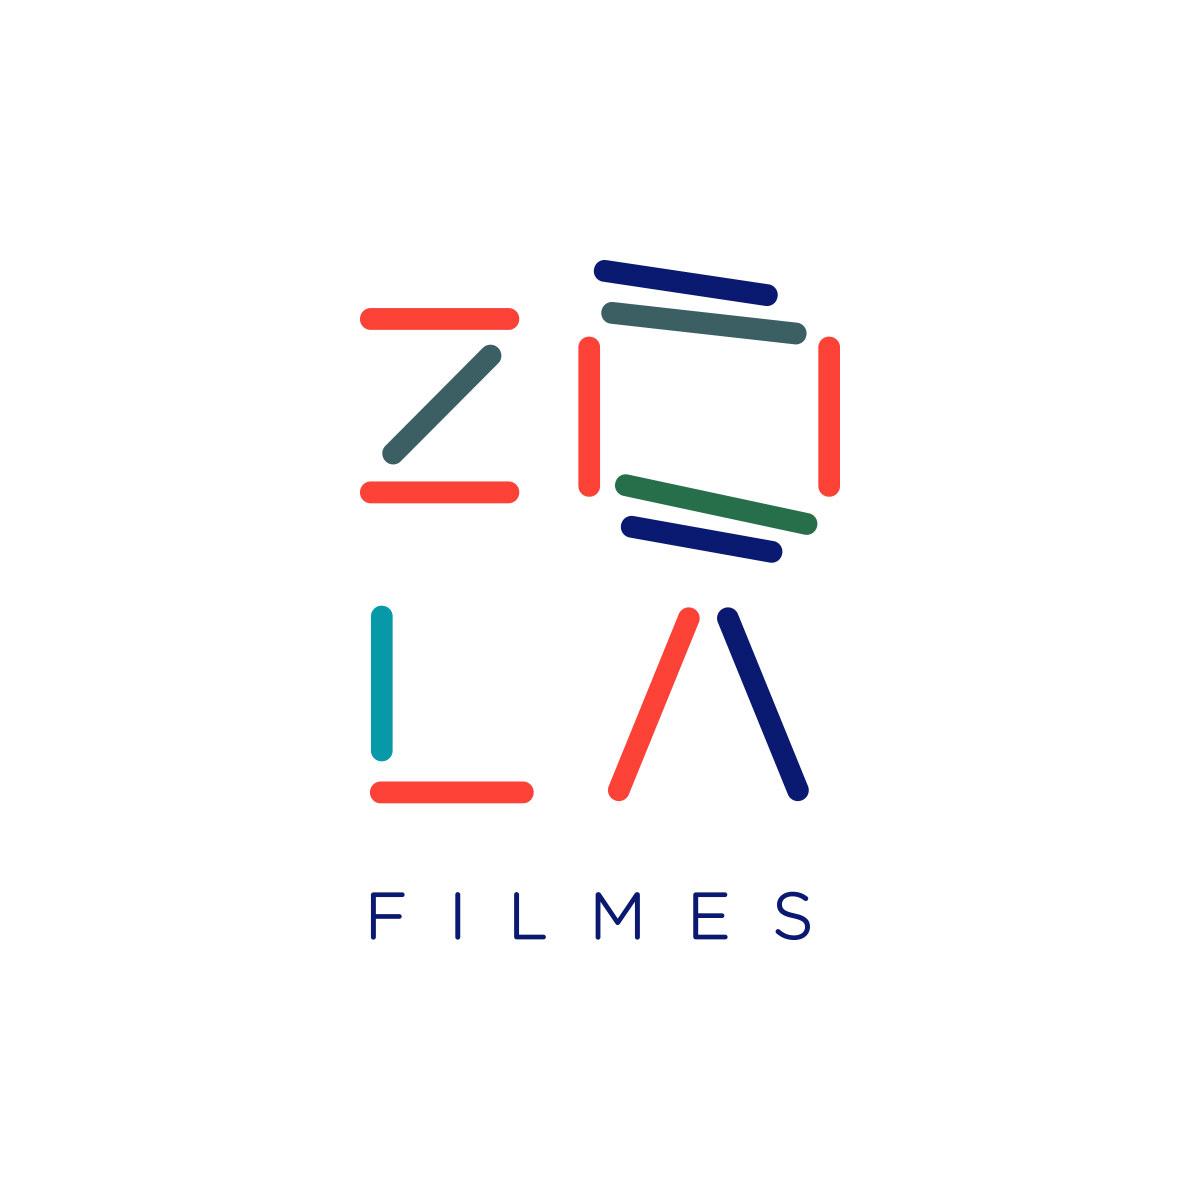 Zola Filmes